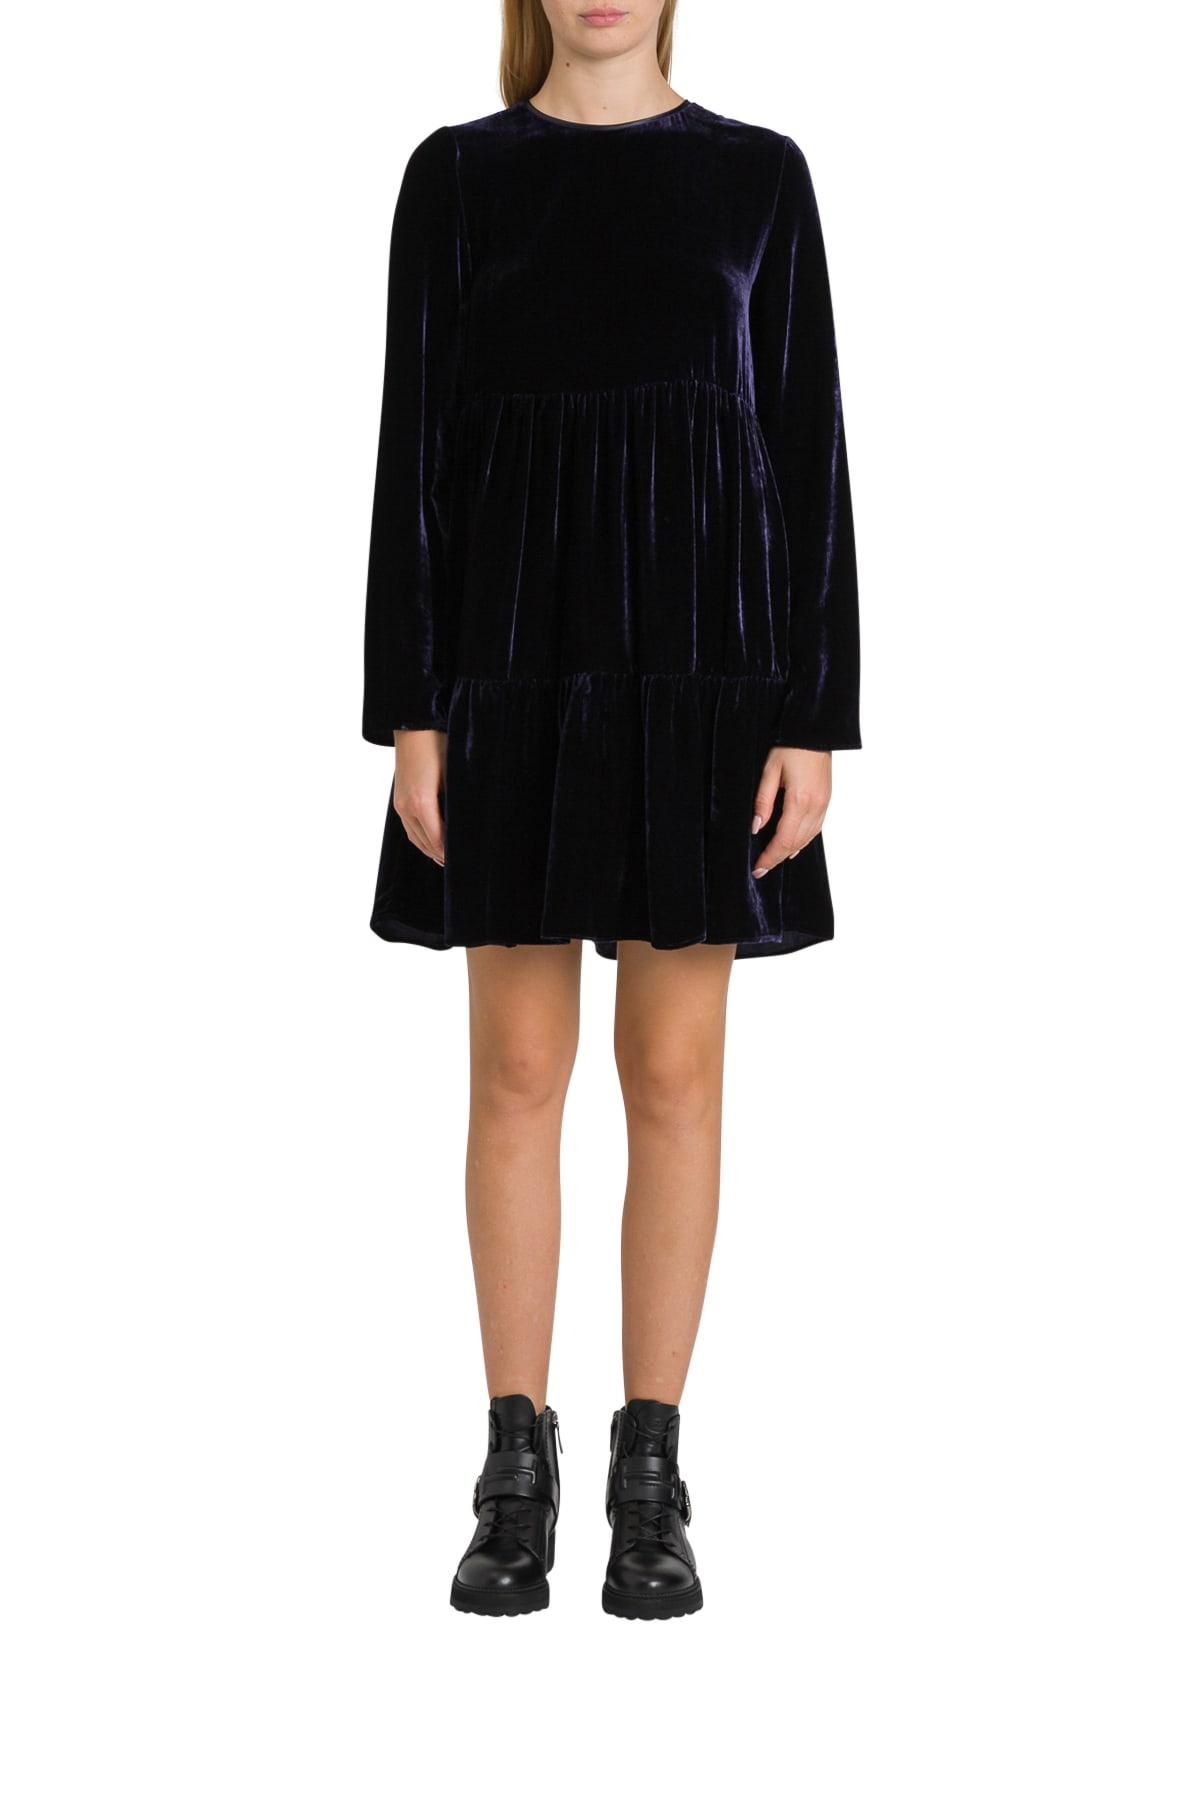 SEMICOUTURE Candice Short Dress